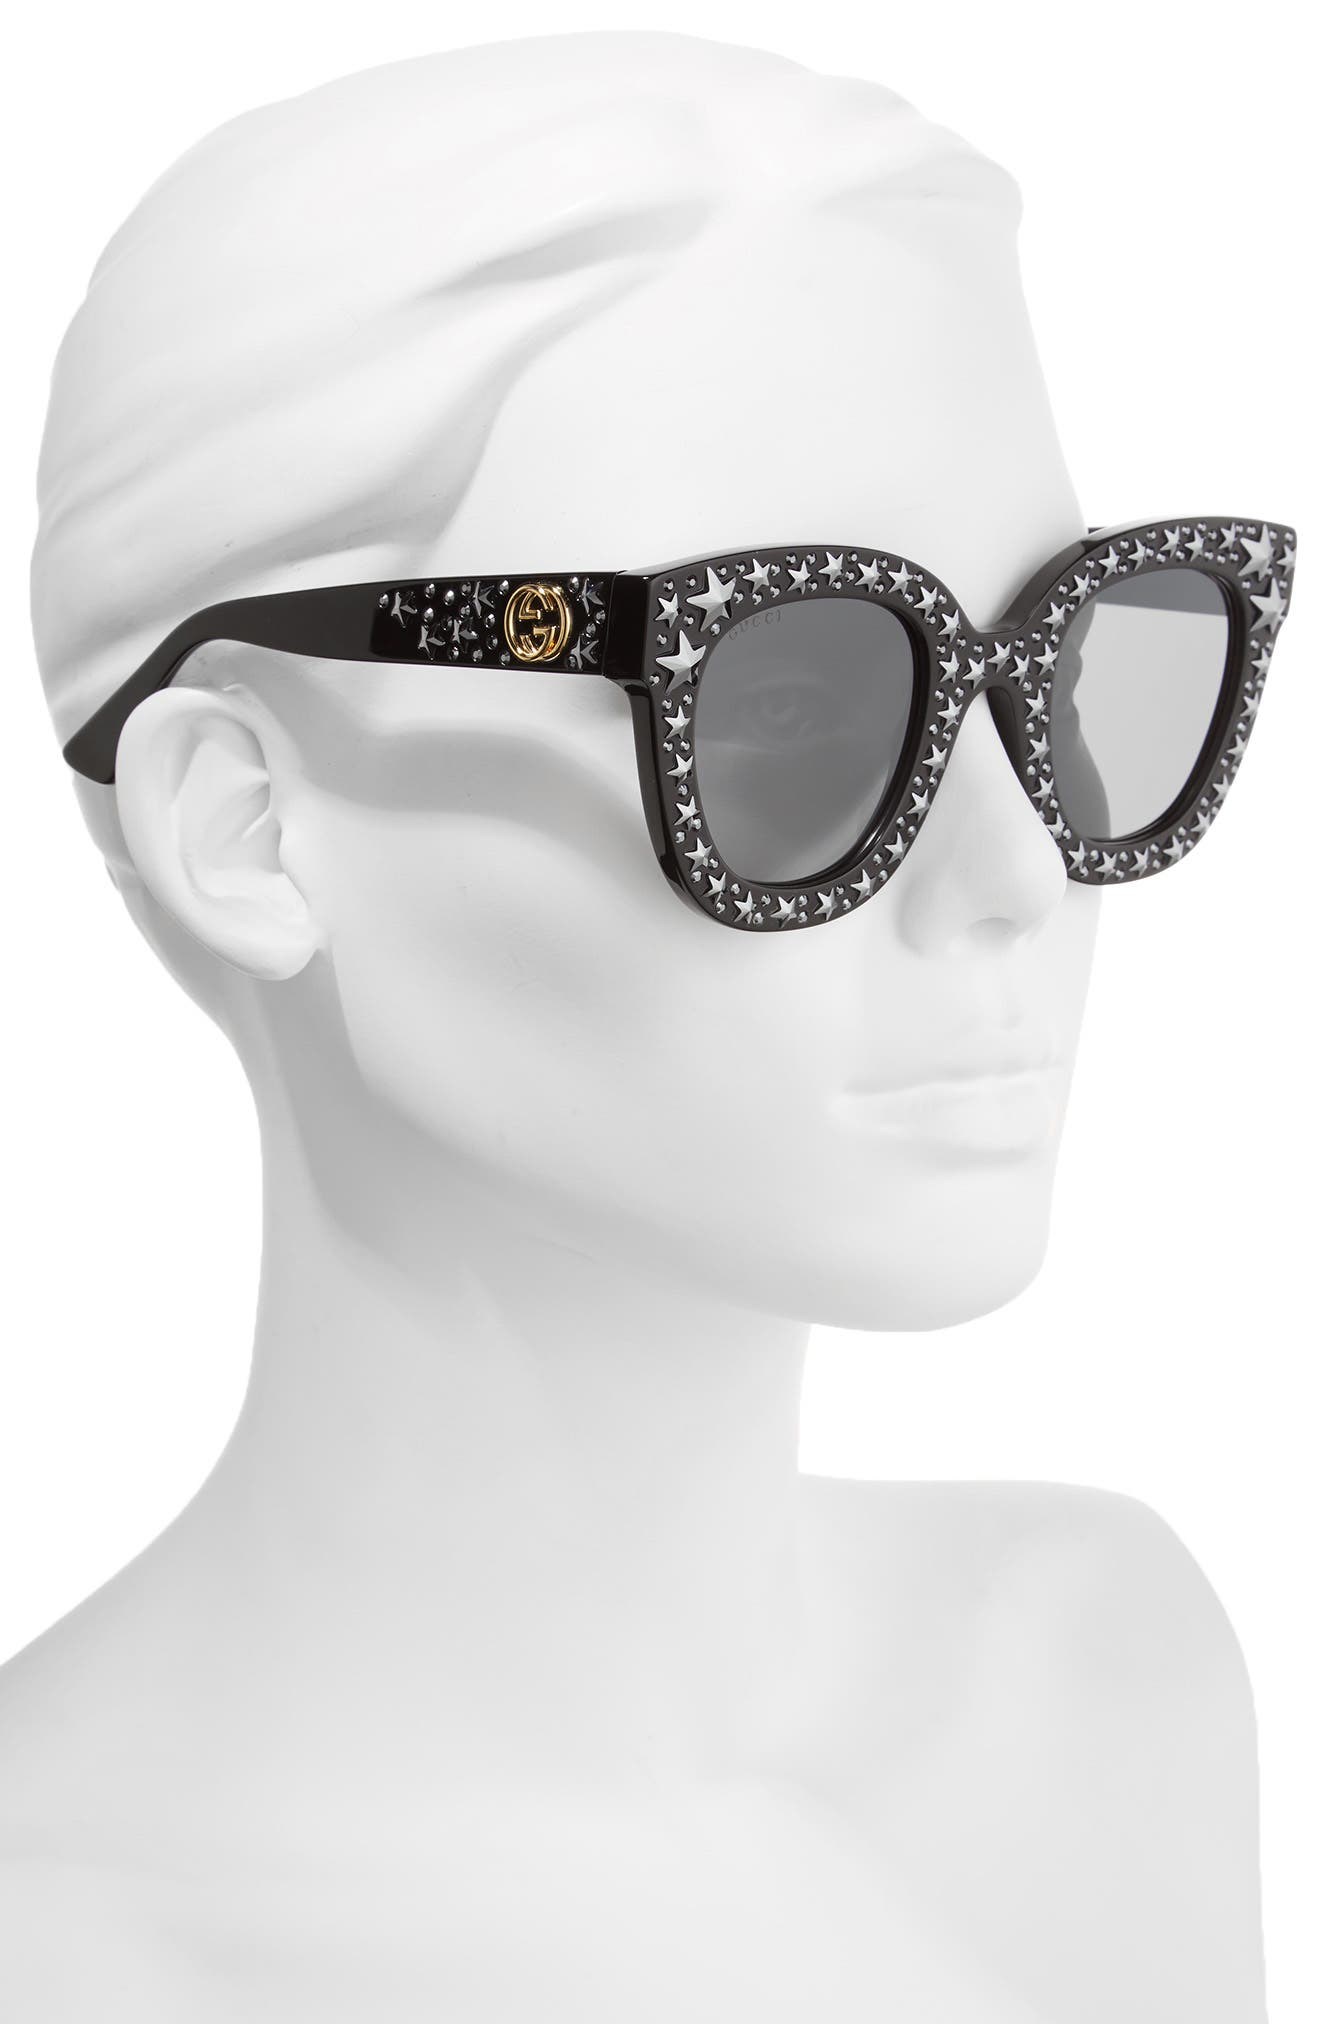 49mm Swarovski Crystal Embellished Square Sunglasses,                             Alternate thumbnail 2, color,                             001